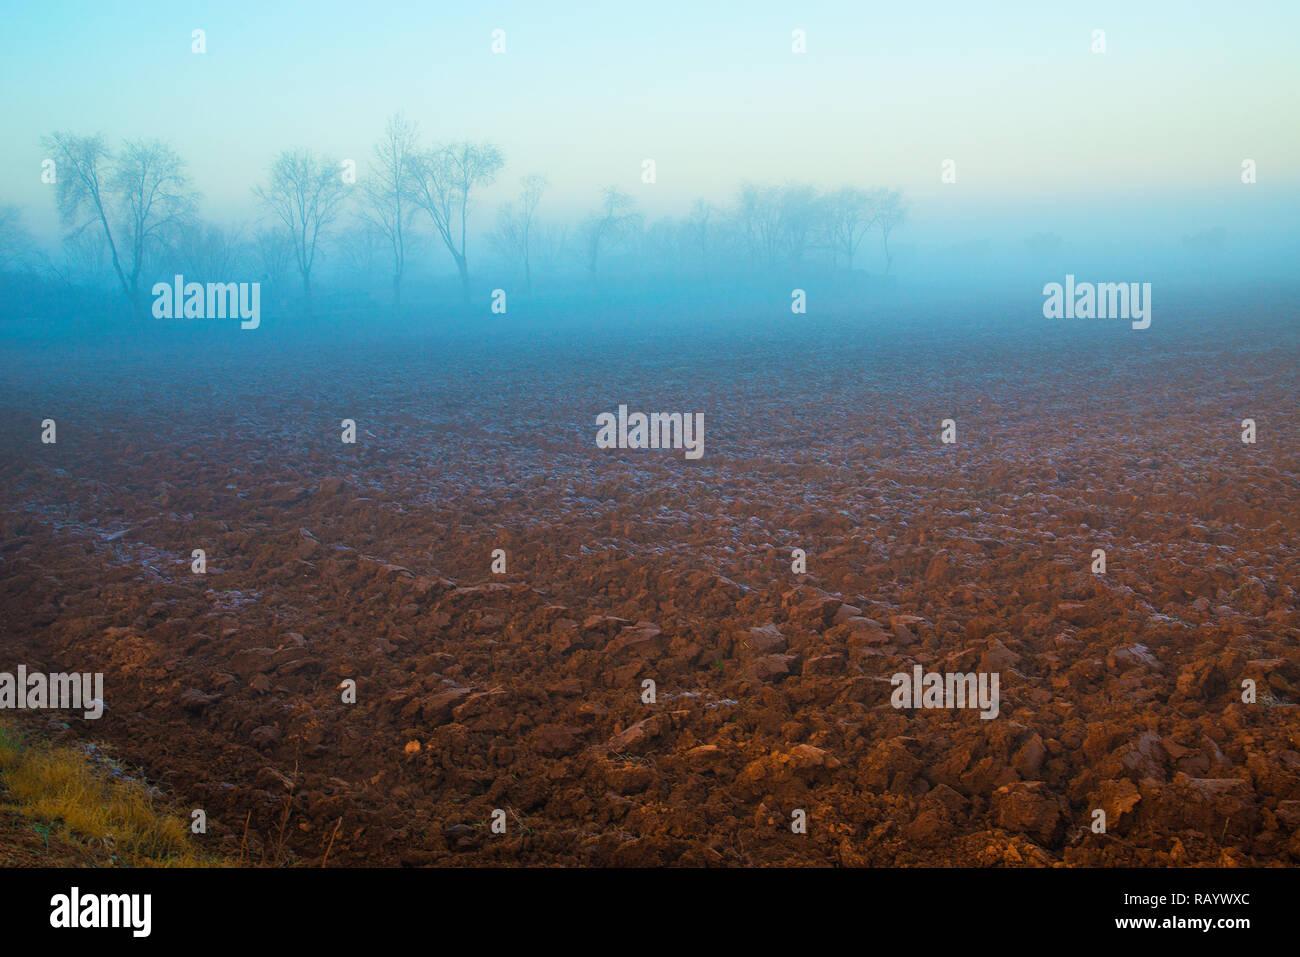 Cultivation field in the mist. Dos Barrios, Toledo province, Castilla La Mancha, Spain. - Stock Image